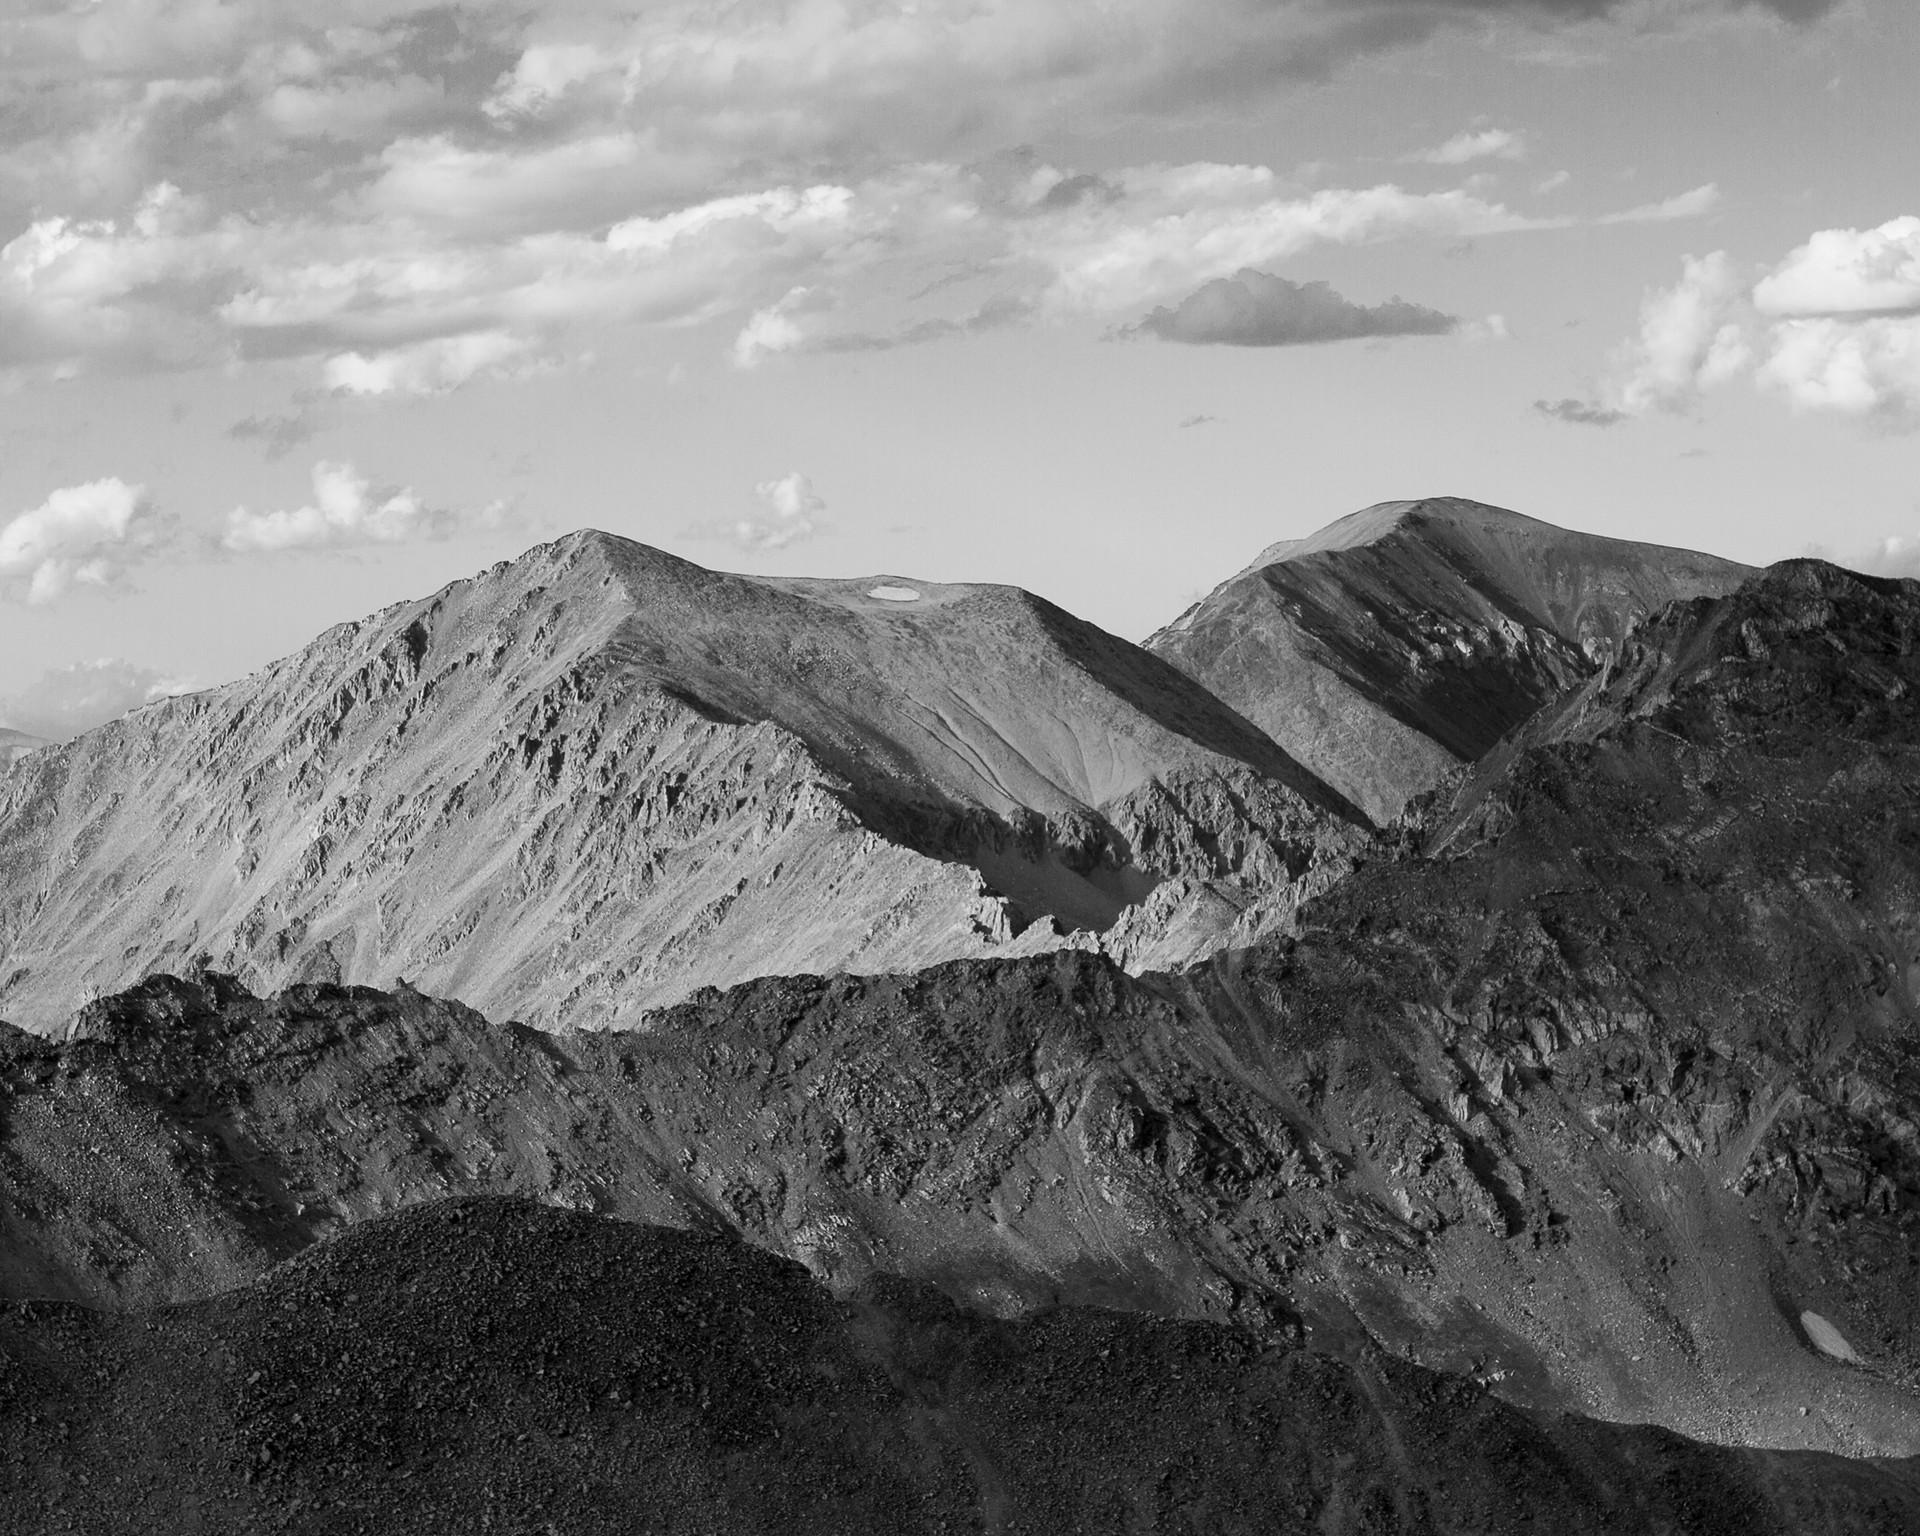 Mount Cameron and Mount Democrat